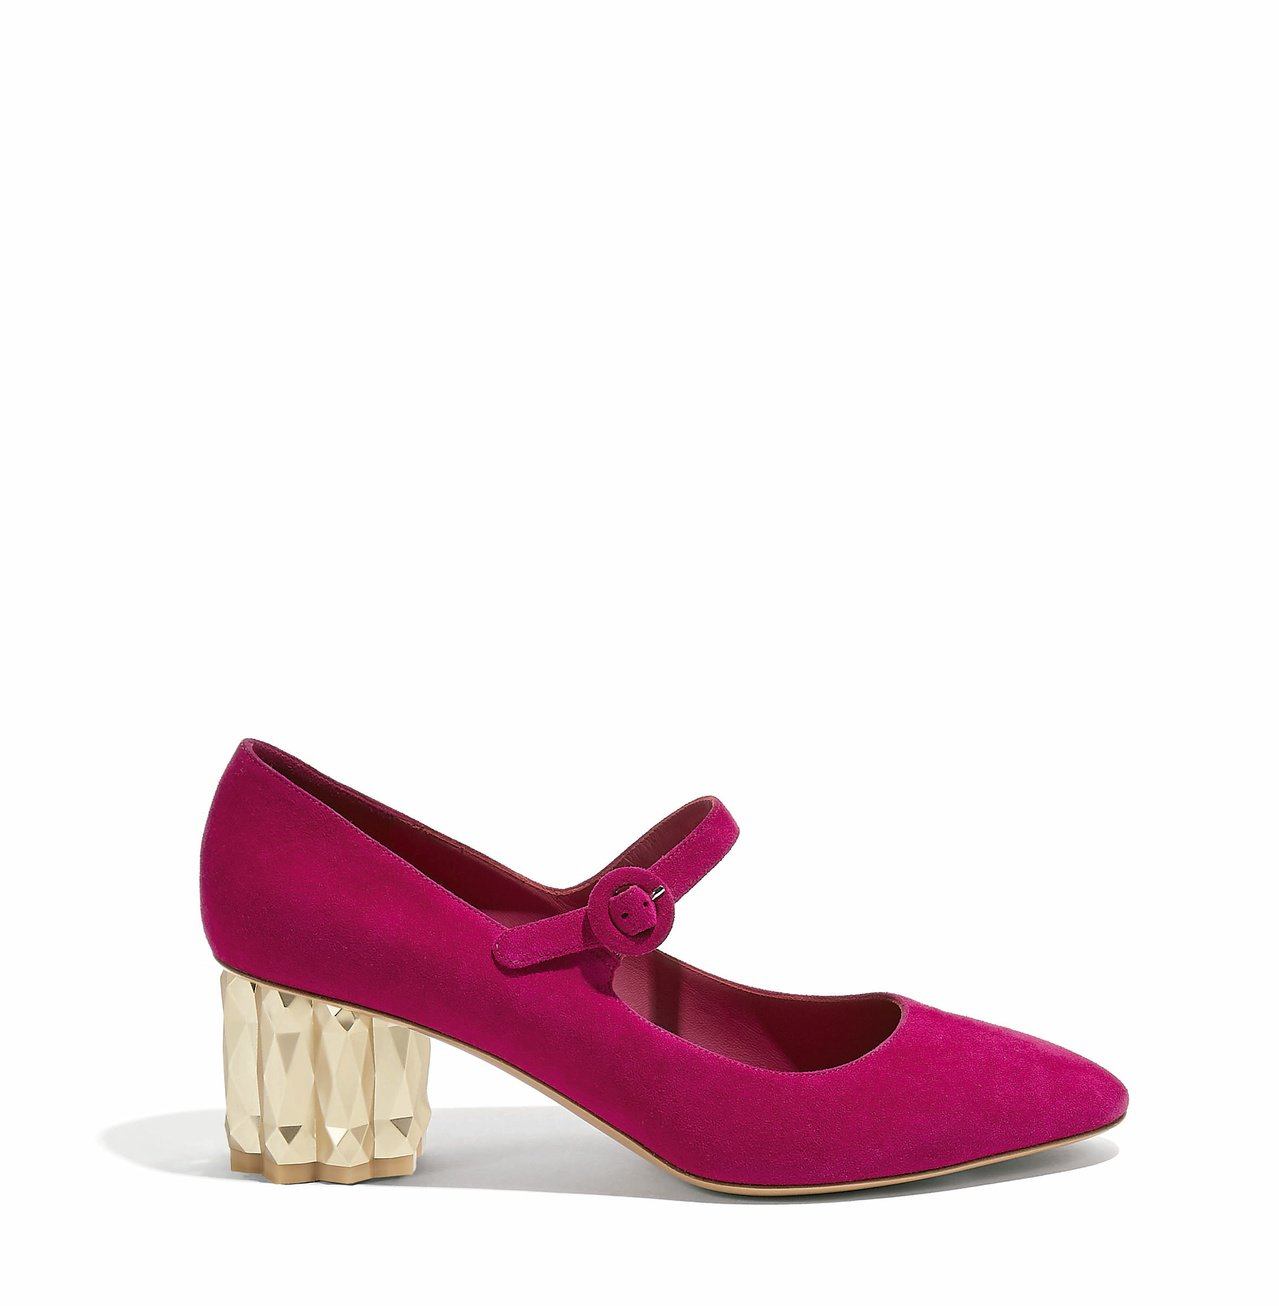 ORTENSIA櫻桃色鑽石跟羊麂皮皮鞋,28,900元。圖/Salvatore ...